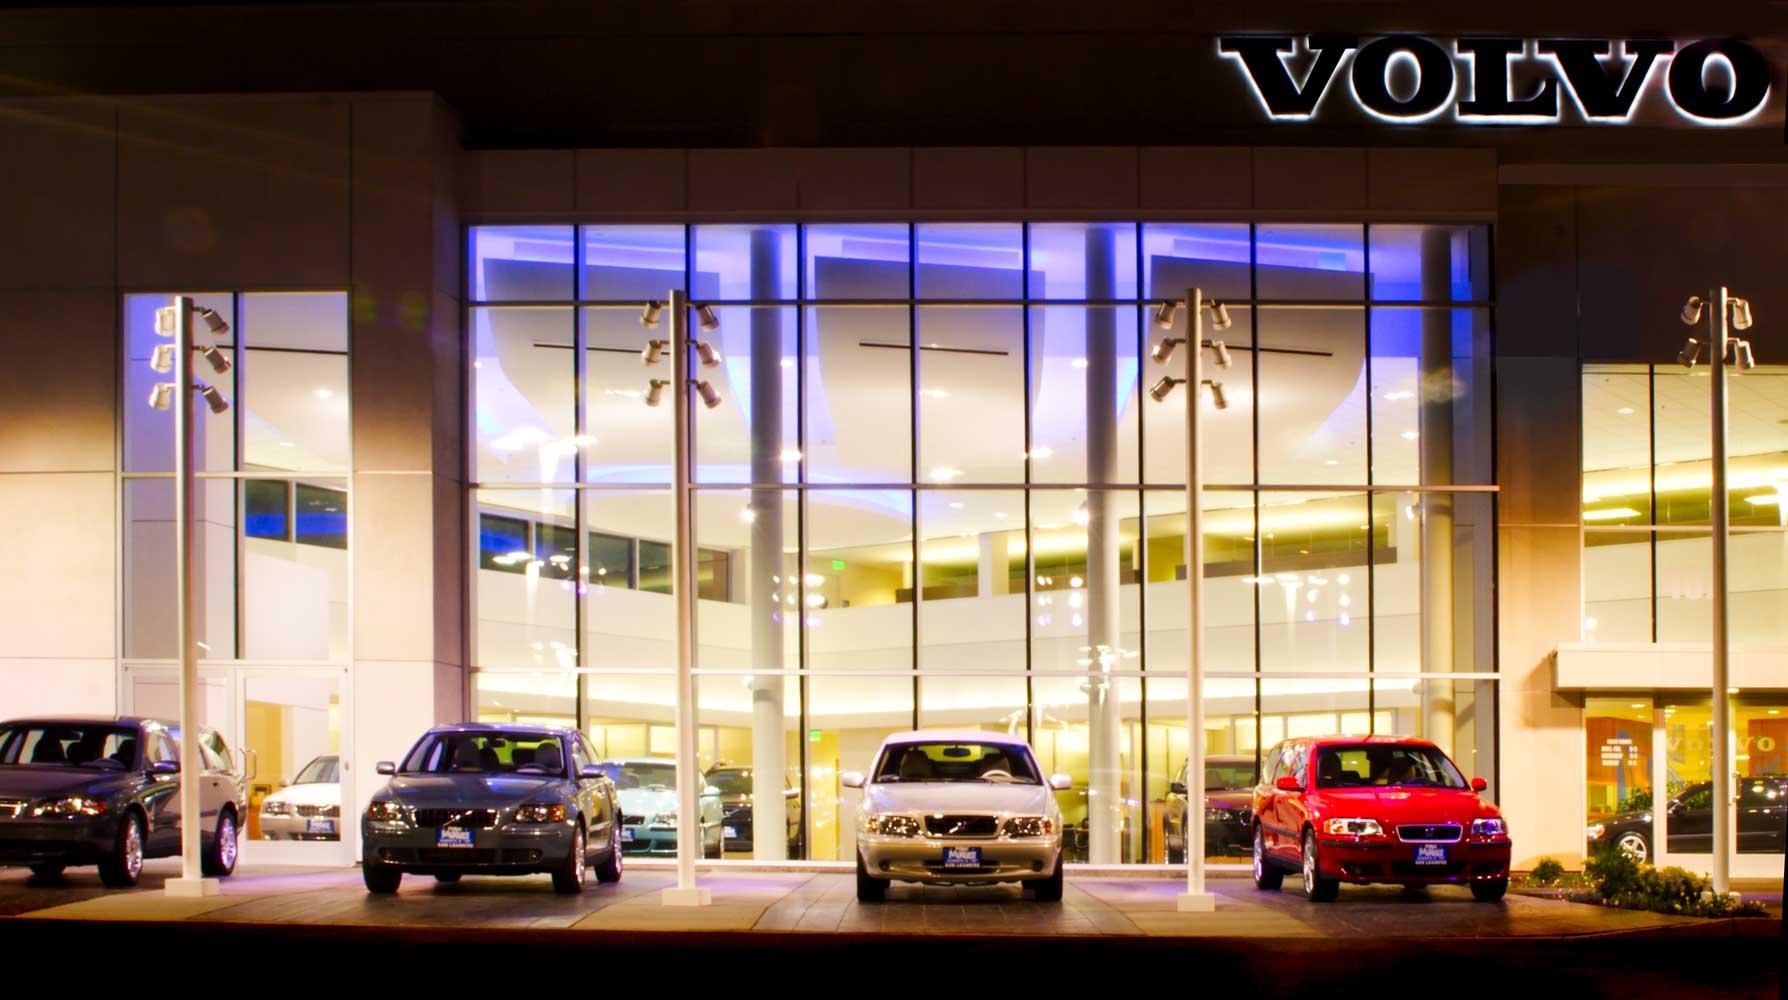 m_McKevitt-Volvo.jpg